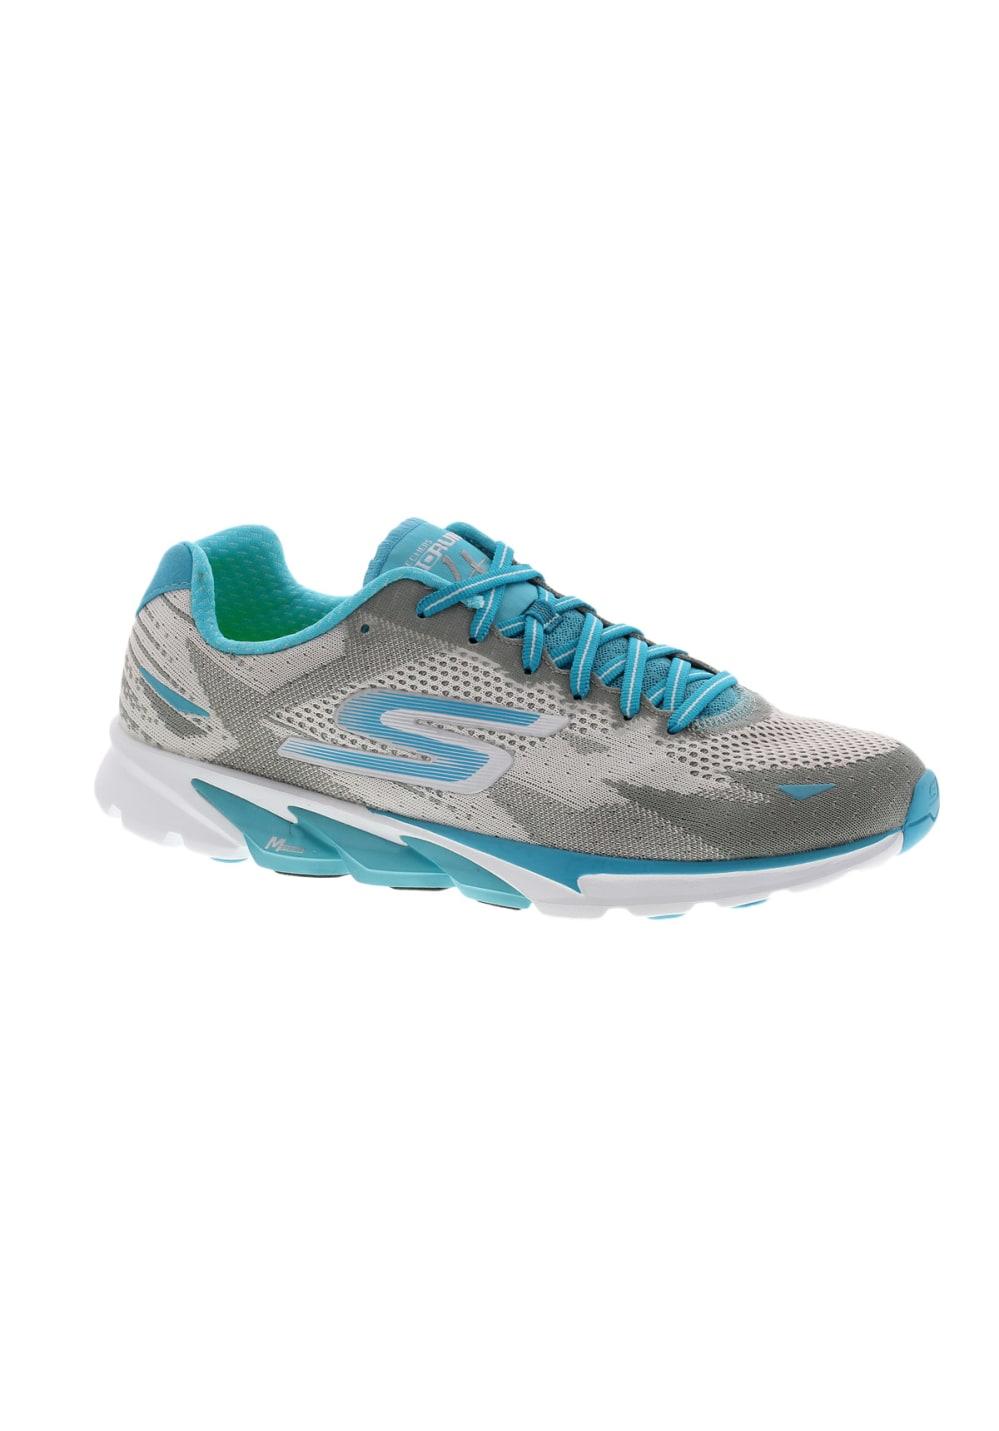 skechers shoes womens grey